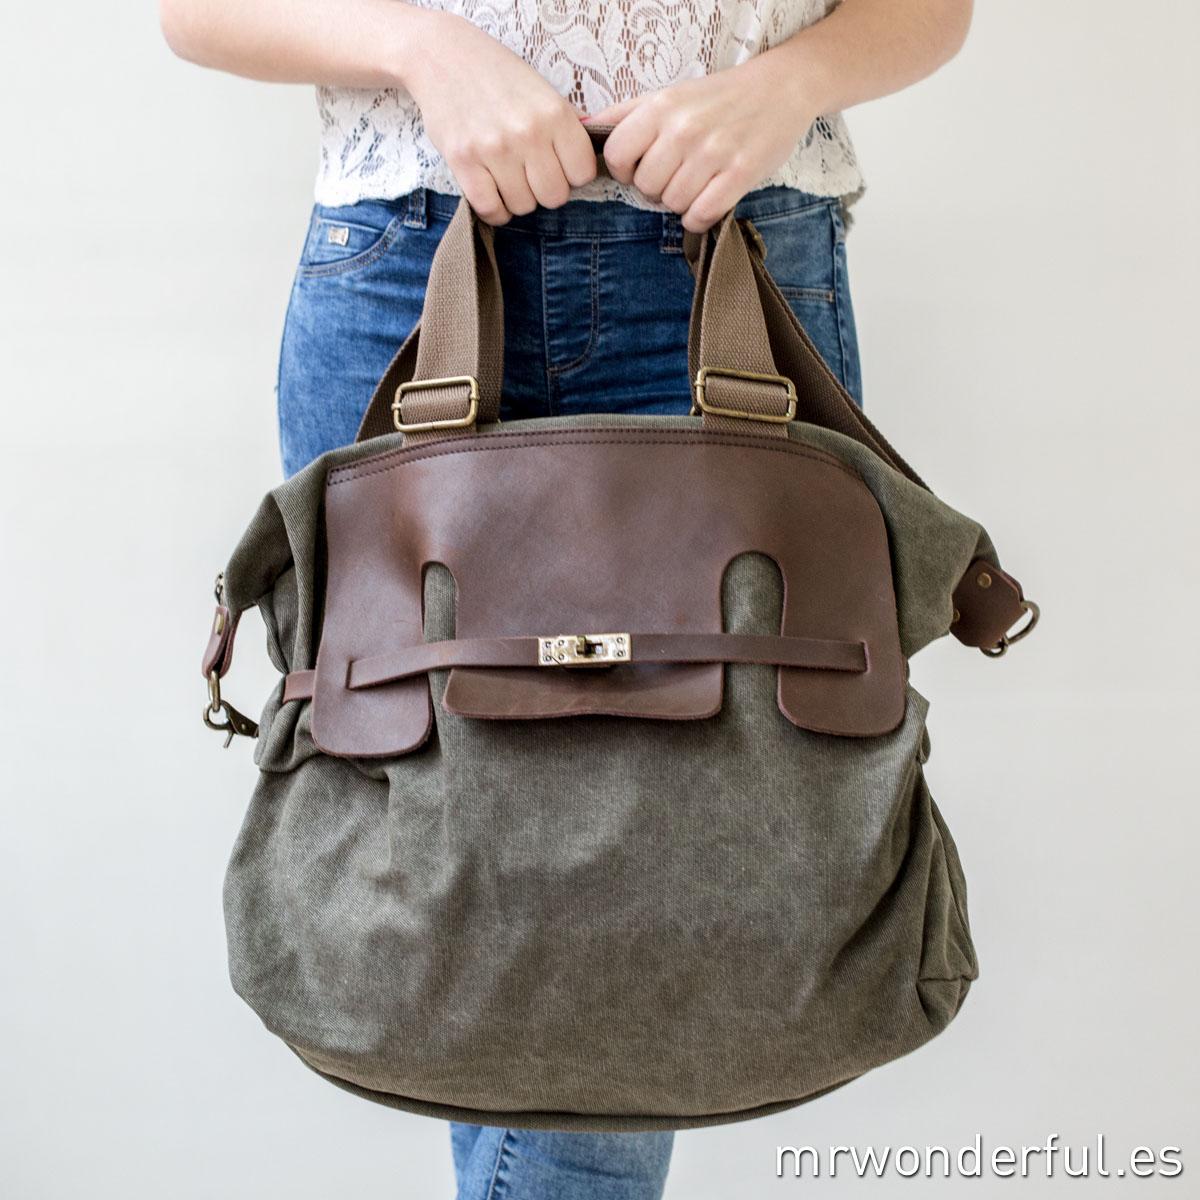 mrwonderful_bags_W2042-Olive-1